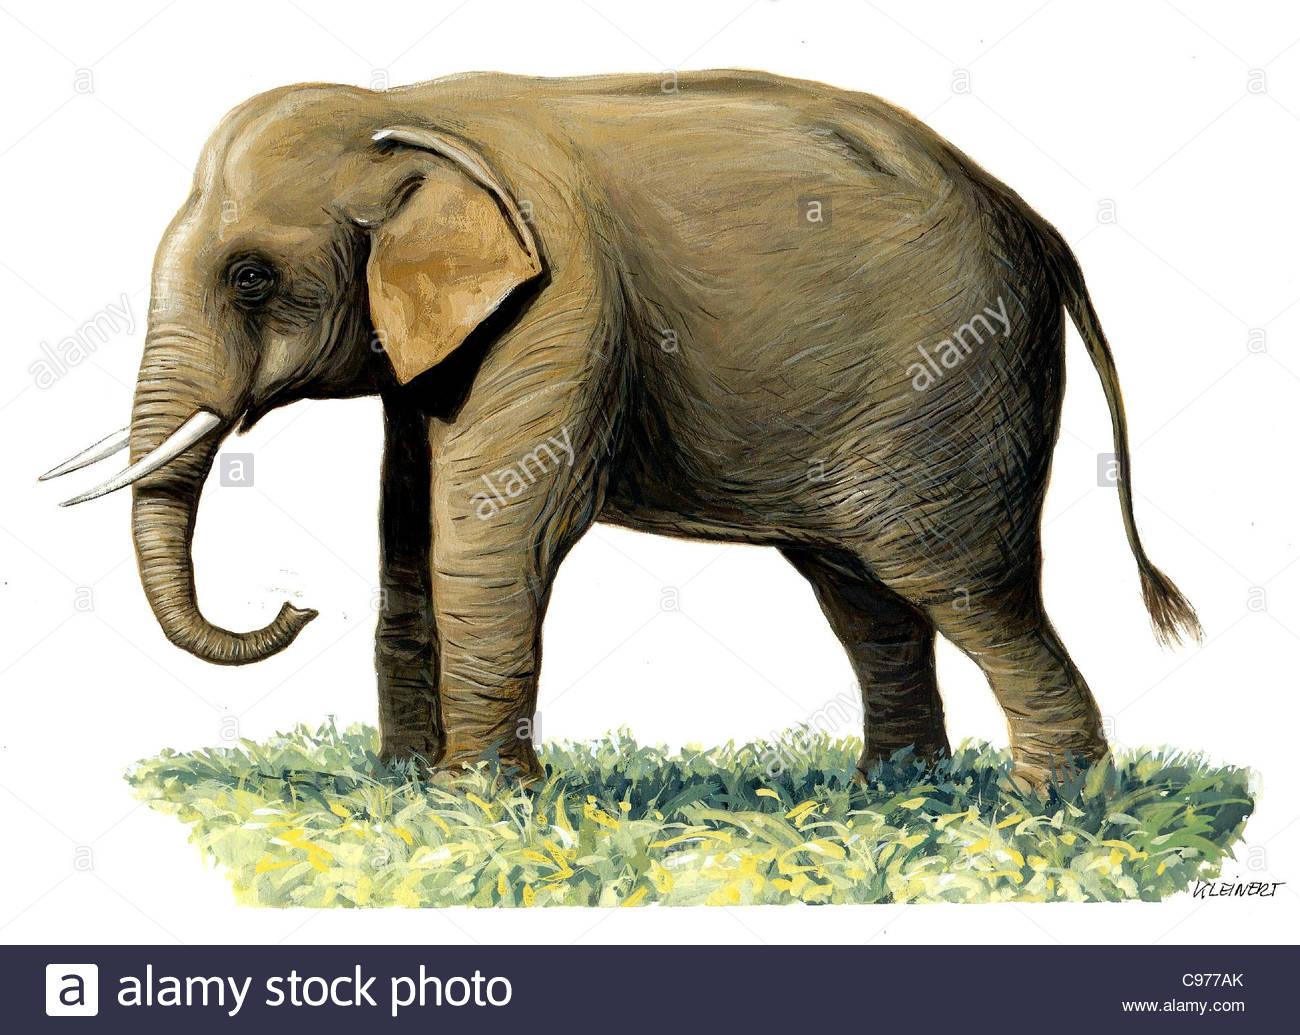 Sumatran elephant Elephas maximus sumatranus Series - Stock Image